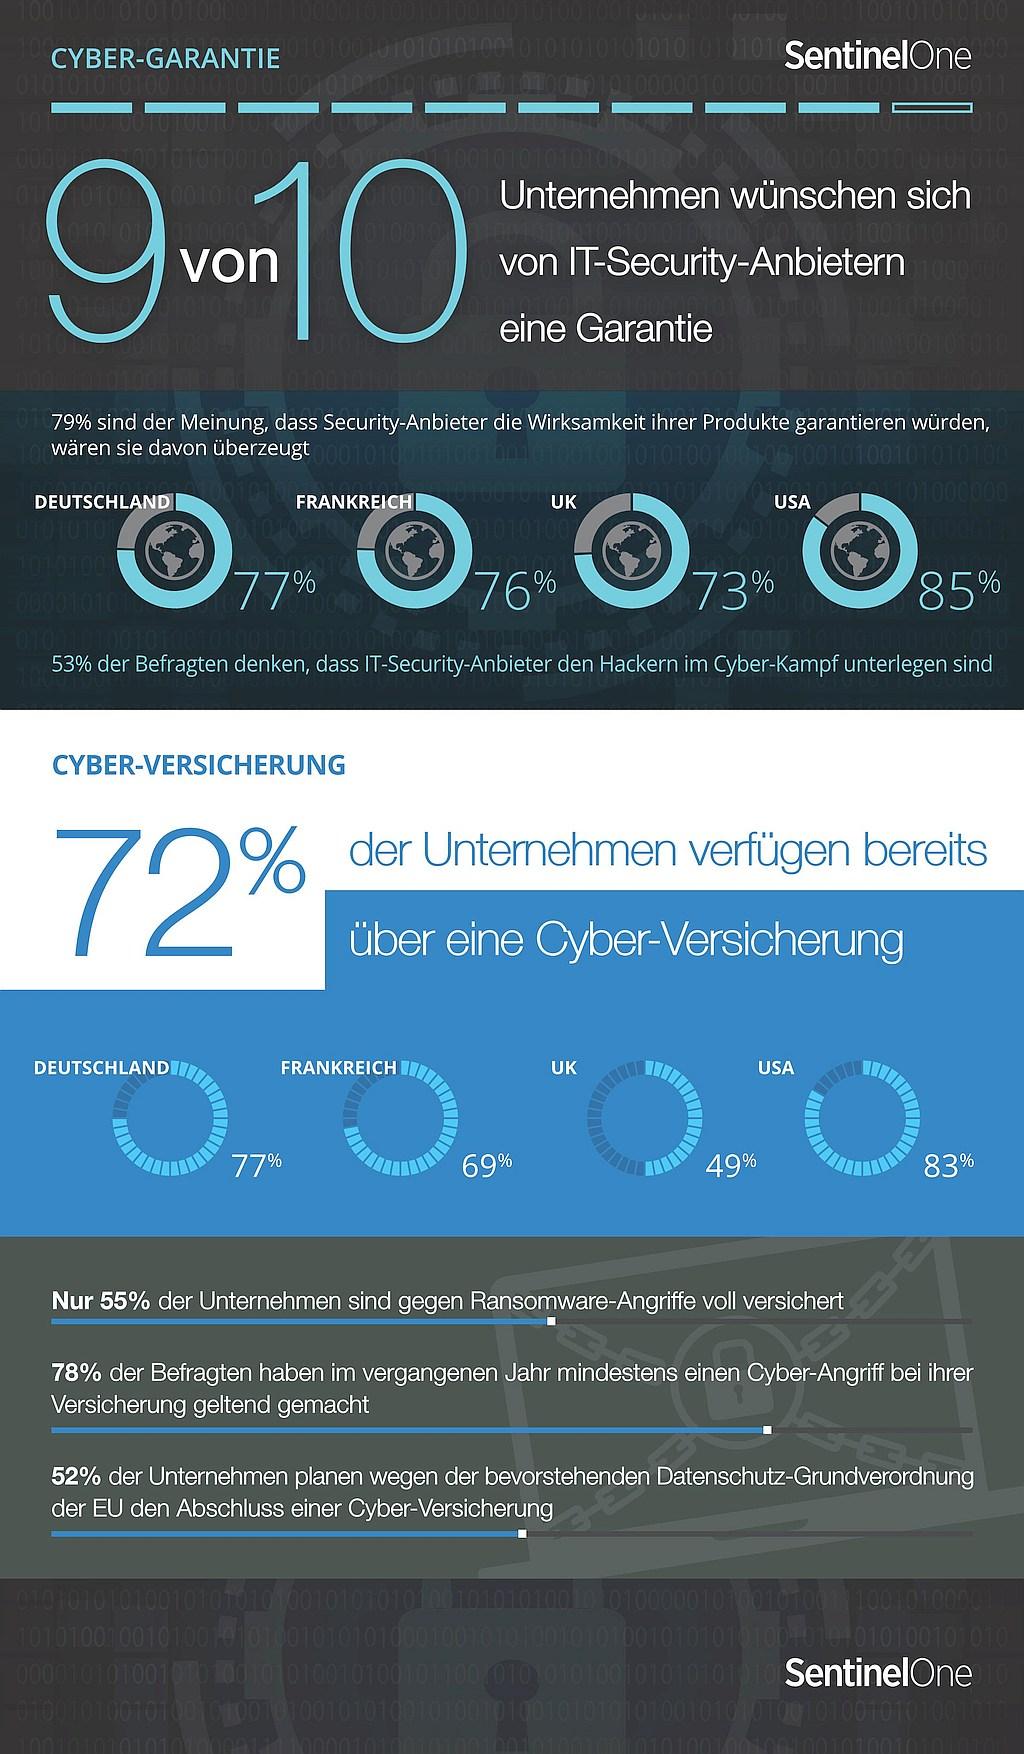 infografik-sentinelone-cybergarantie-cyberversicherung